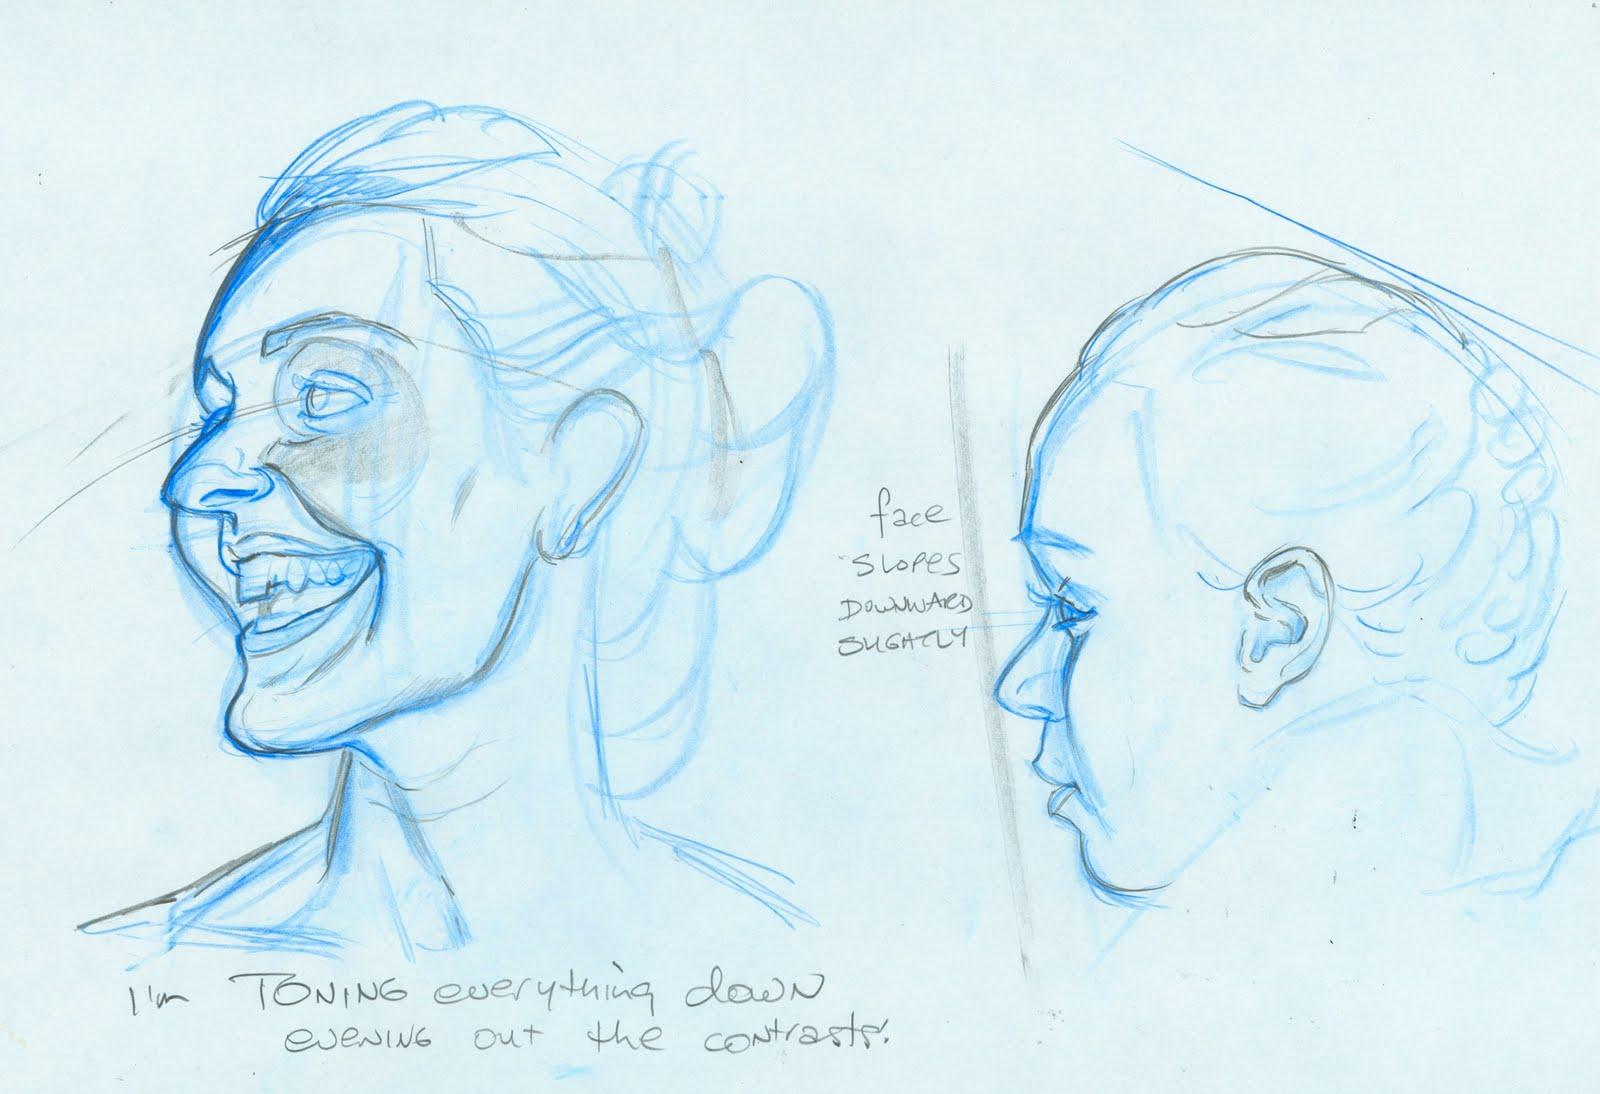 Line Drawing Of Human Face : John k stuff does all this human drawing help cartooning